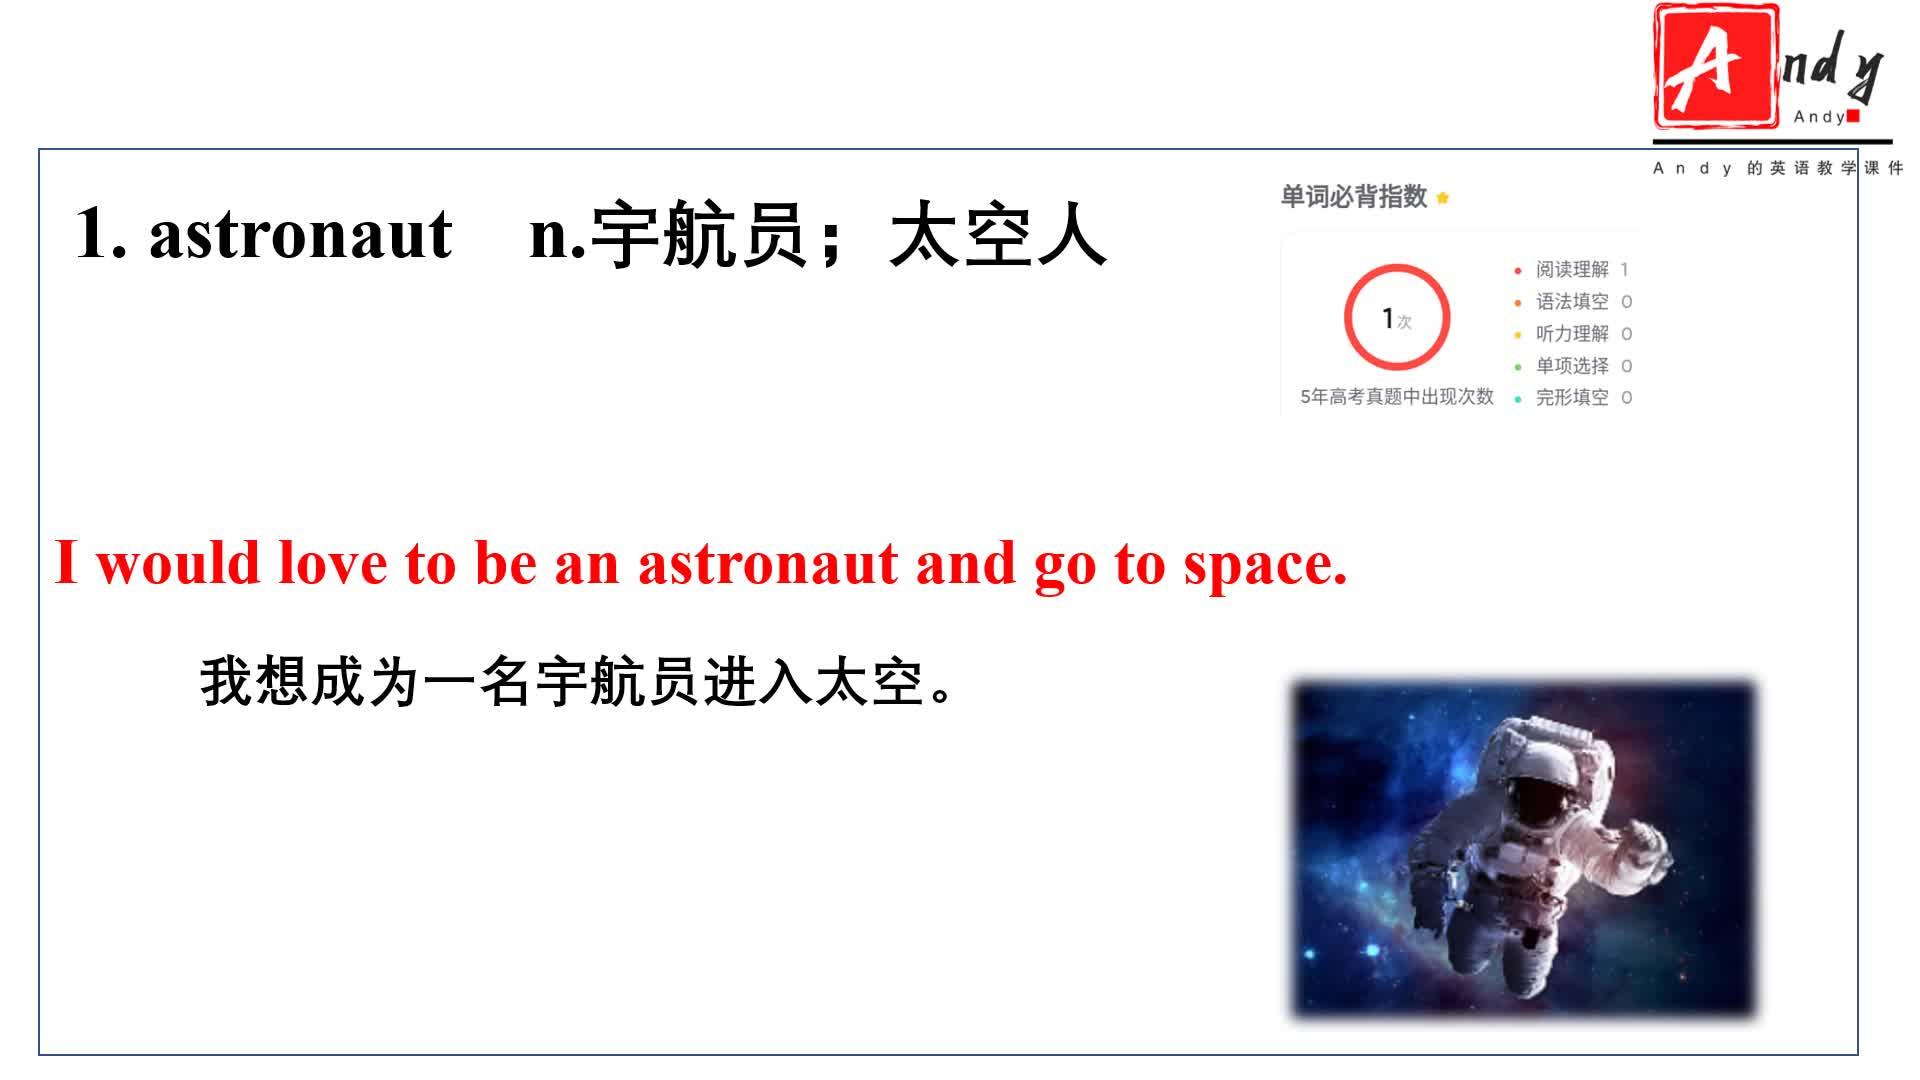 Unit 4 Space exploration 多模态词汇视频【新教材】2020-2021学年人教版(2019)高中英语必修第三册